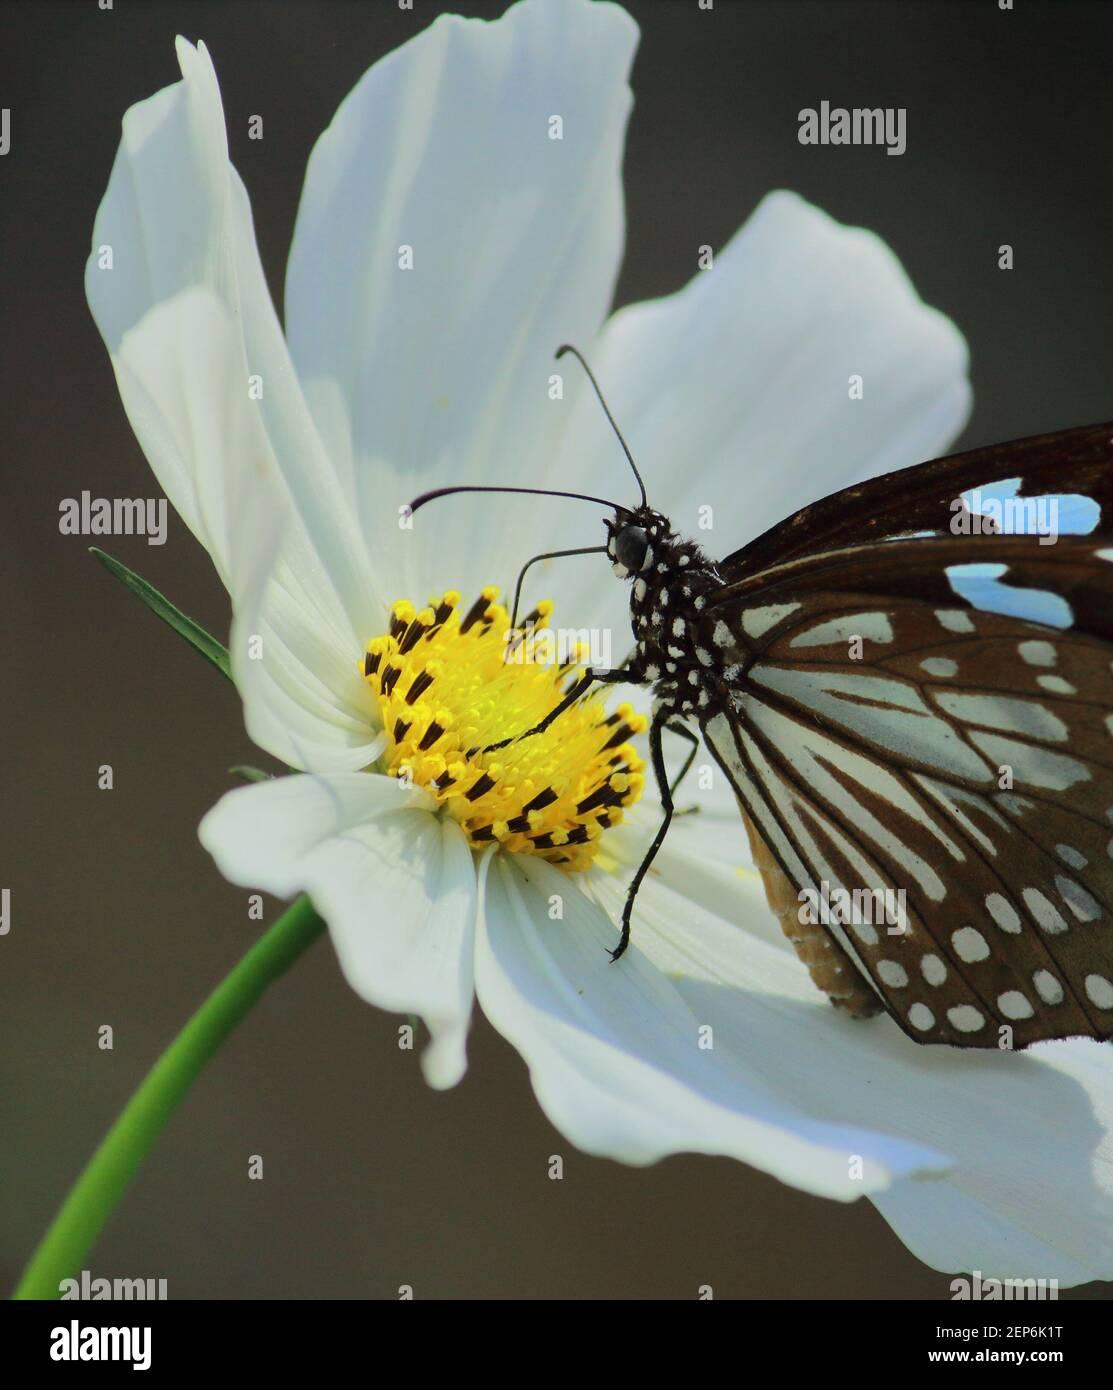 la mariposa azul tigre o tirumala limniace es chupar néctar de flor cosmos, jardín de mariposas en bengala occidental, india Foto de stock